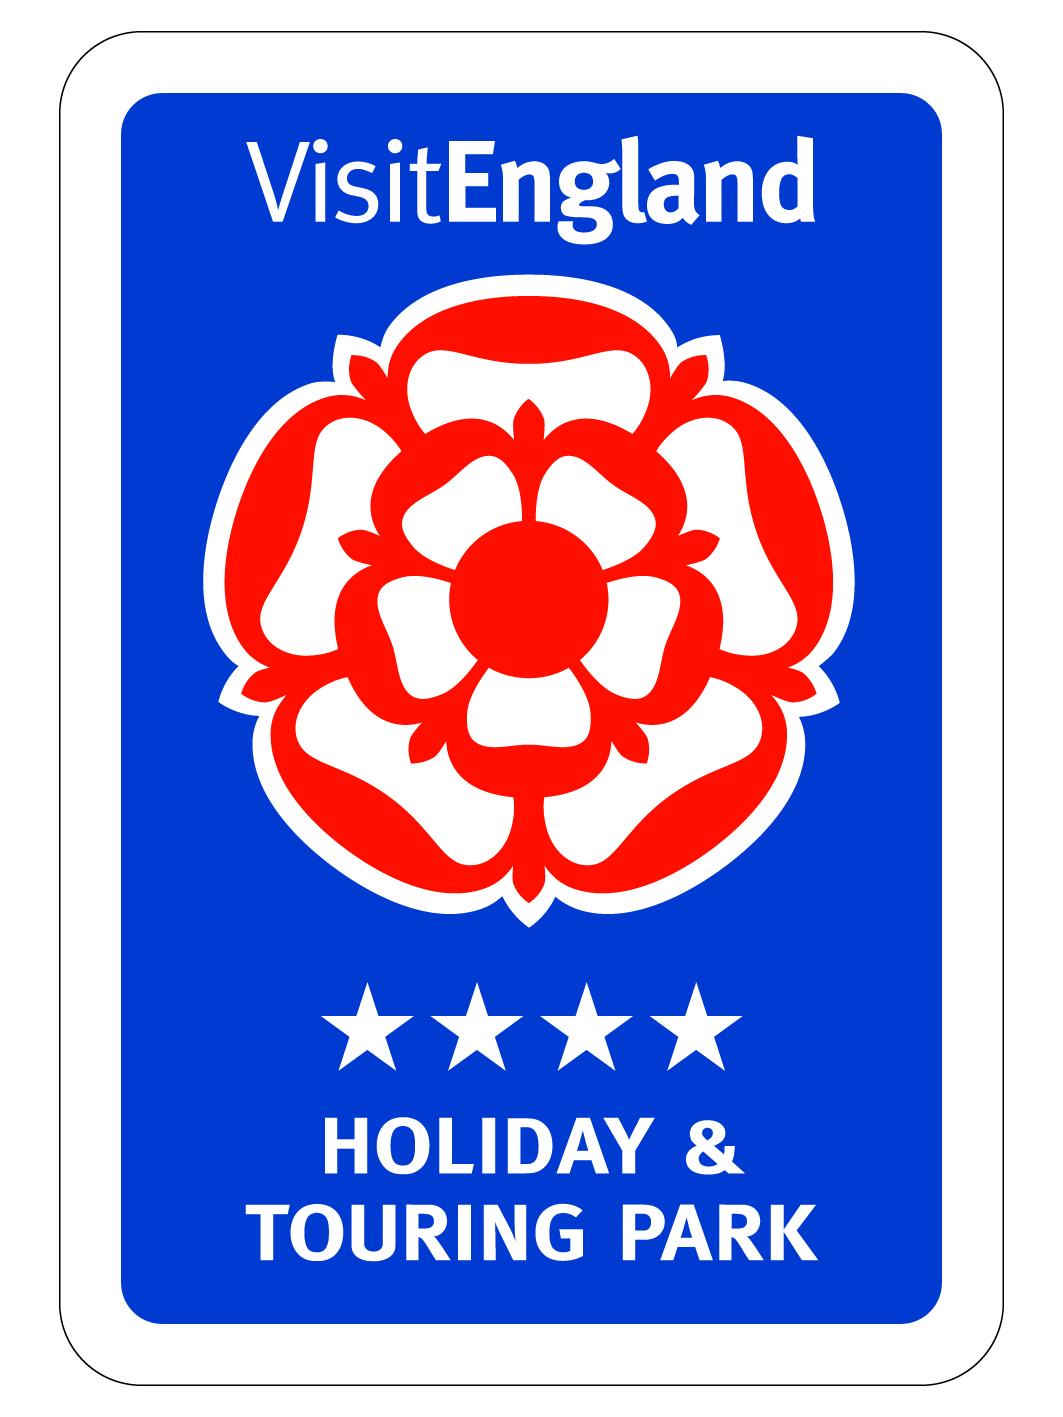 VISIT ENGLAND - 4 STAR HOLIDAY & TOURING PARK (1).jpg